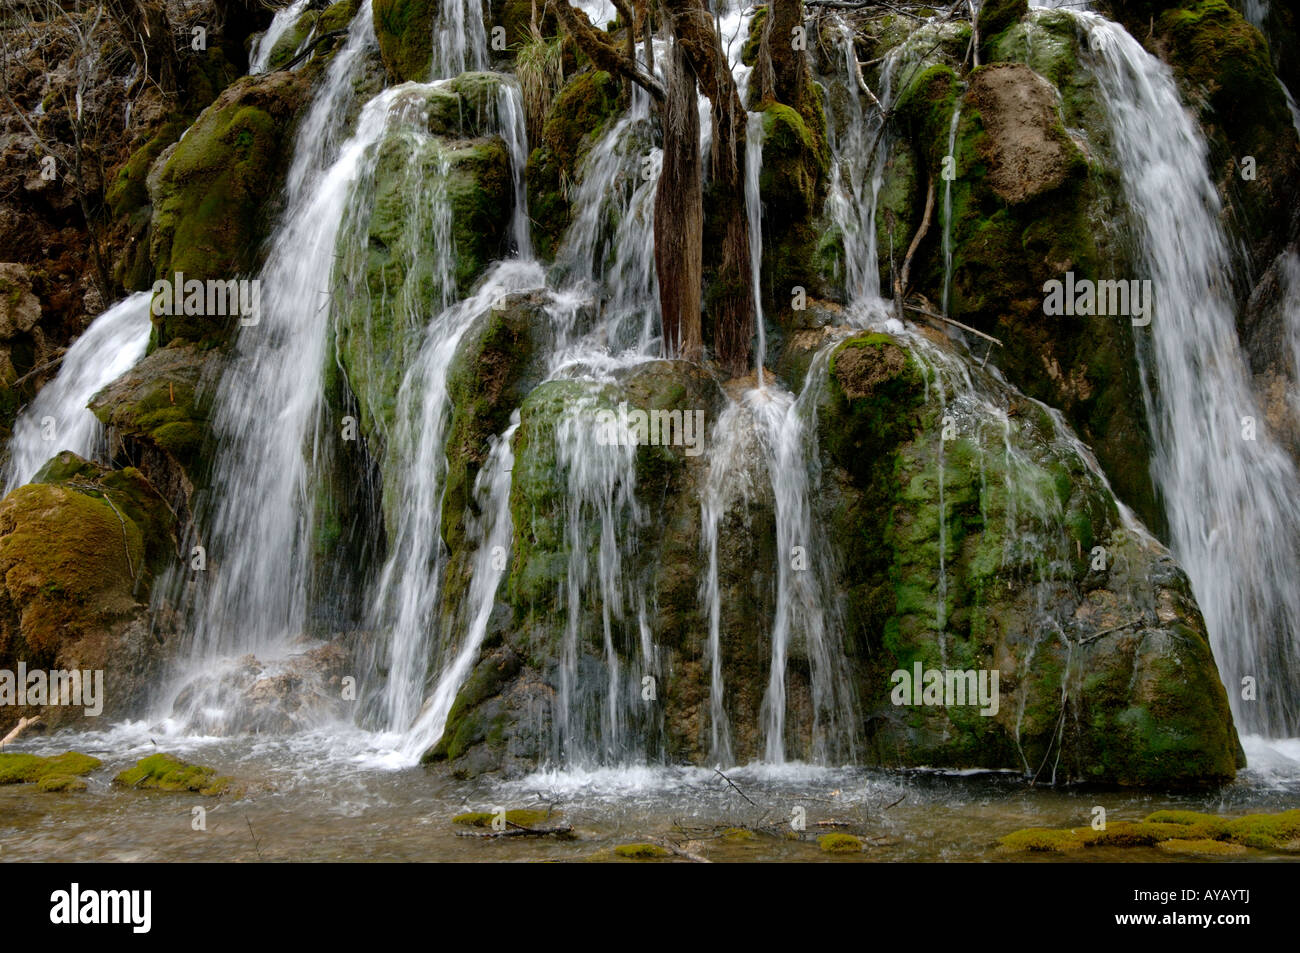 Moose Auf Pfeil Bambus Wasserfall In Mab Man And Biosphere Reserve